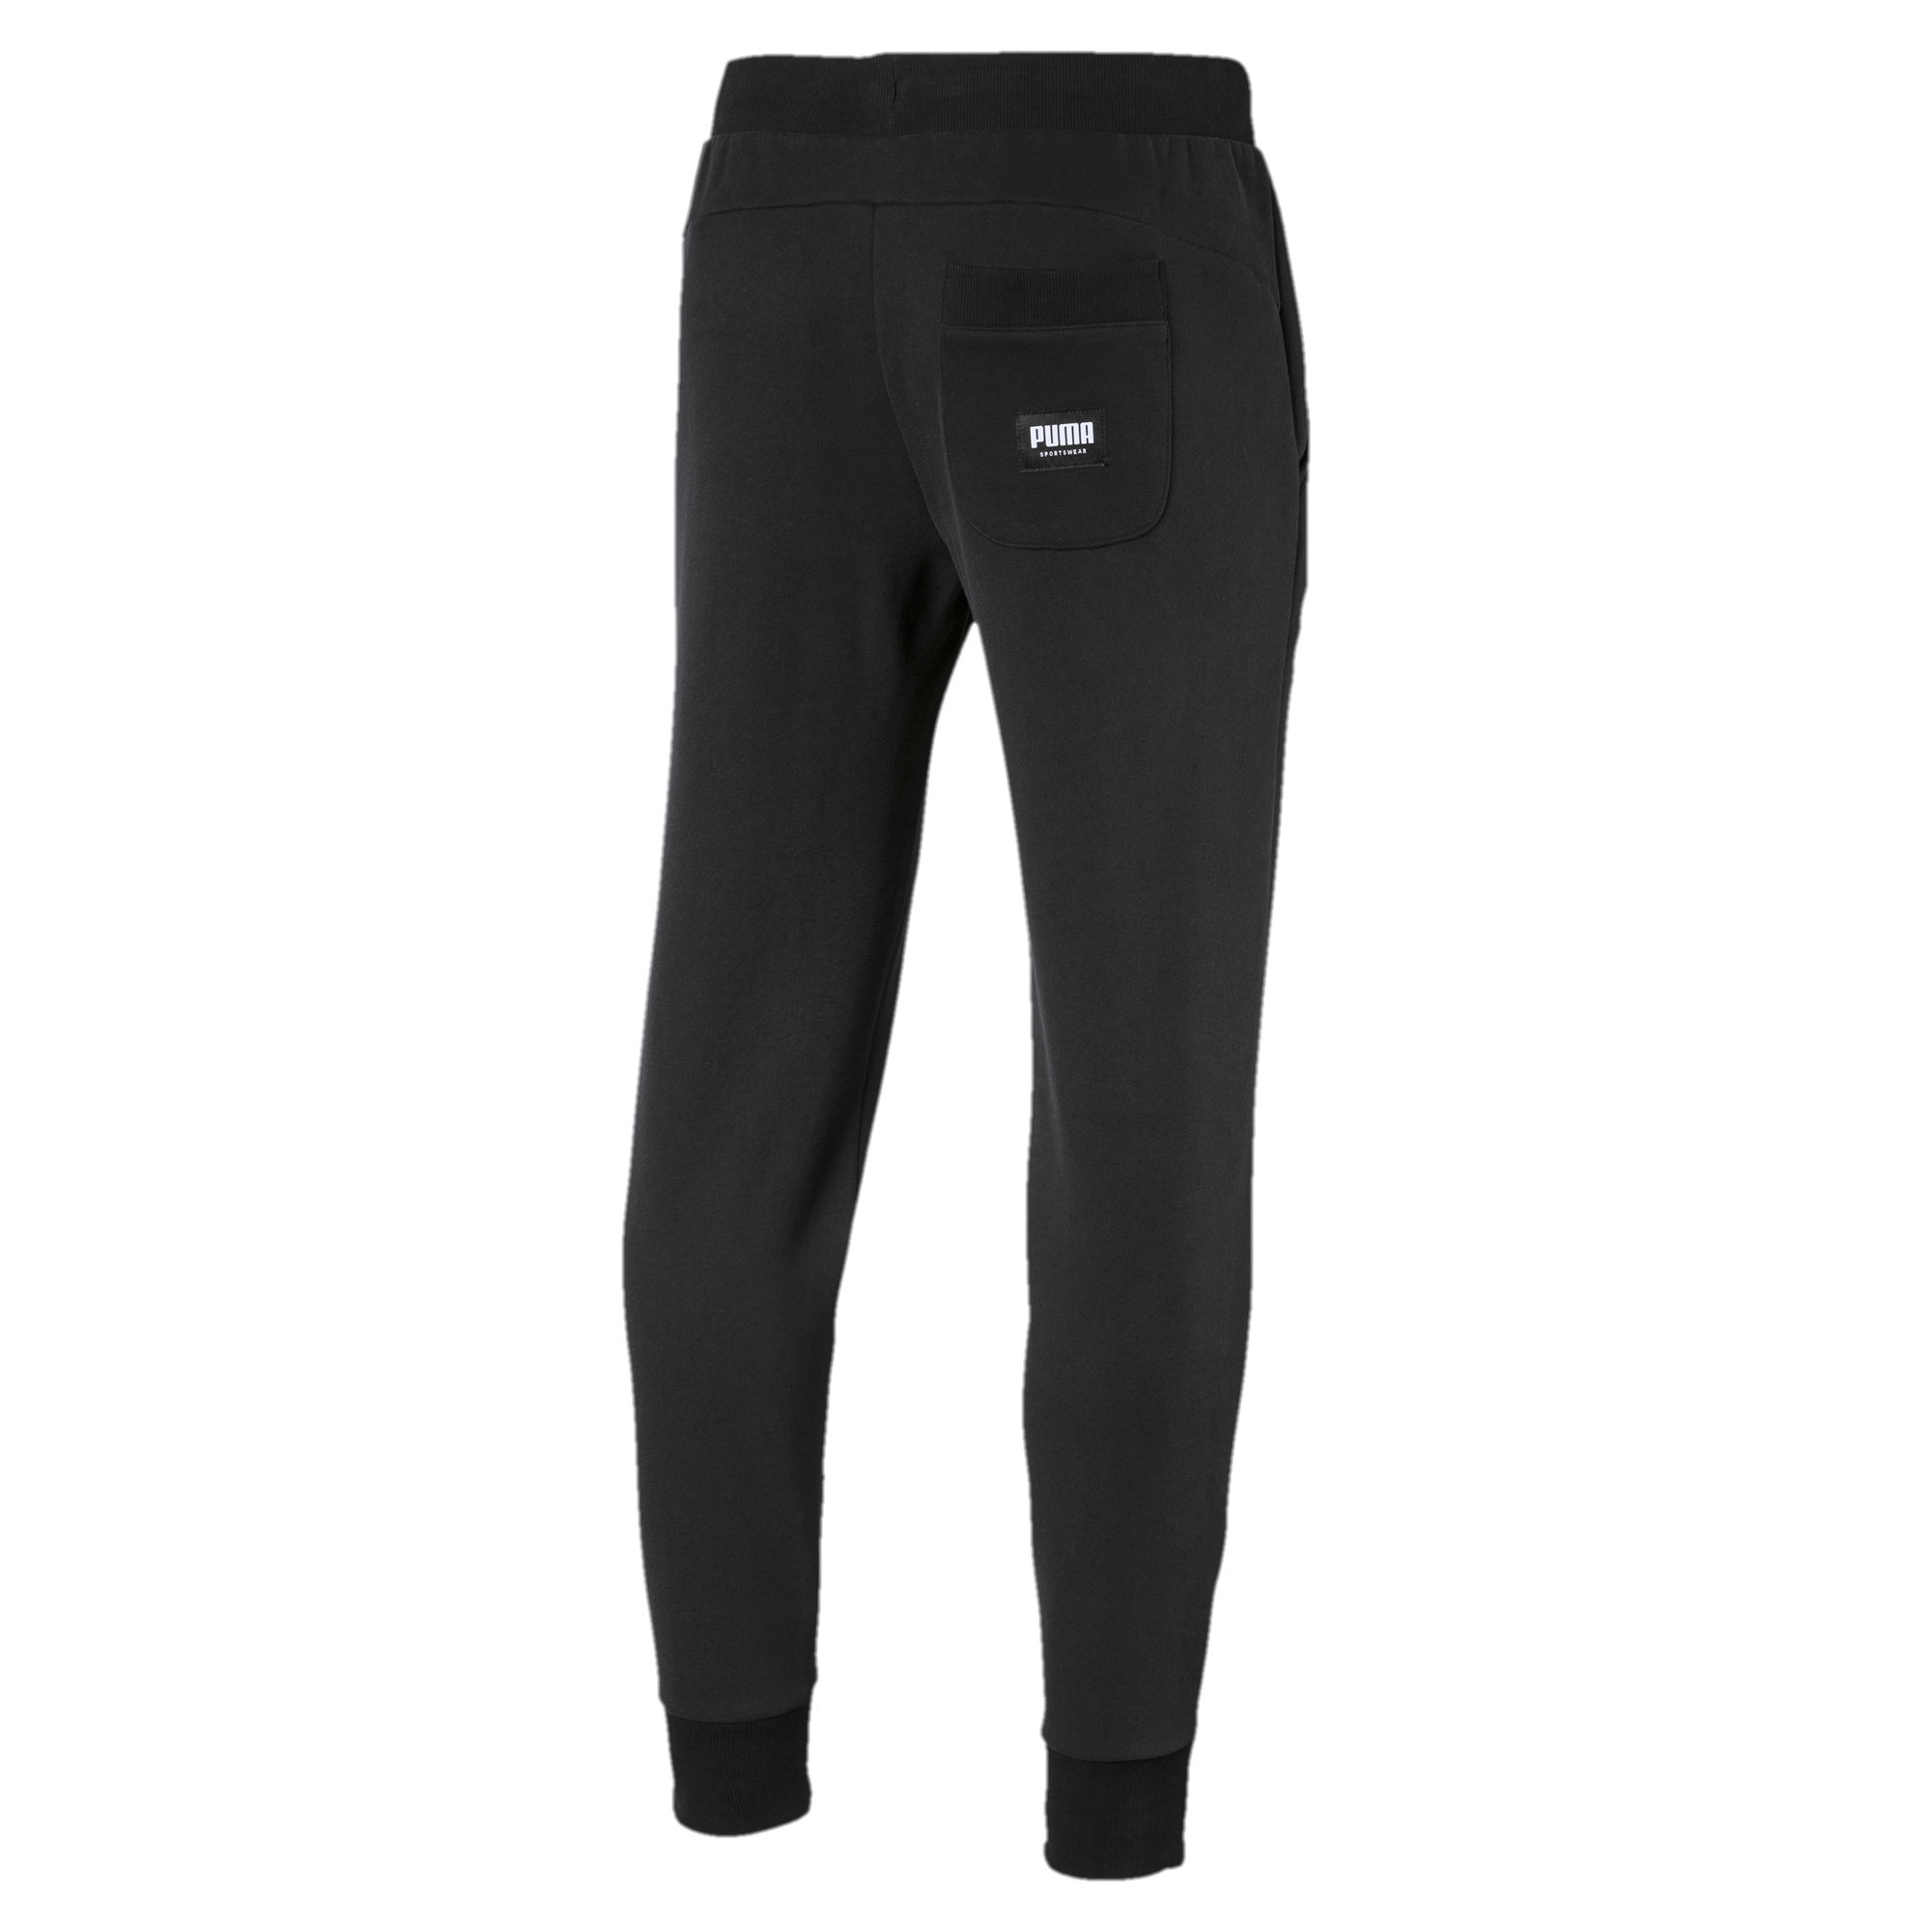 PUMA-Athletics-Men-039-s-Fleece-Pants-Men-Knitted-Pants-Basics thumbnail 8